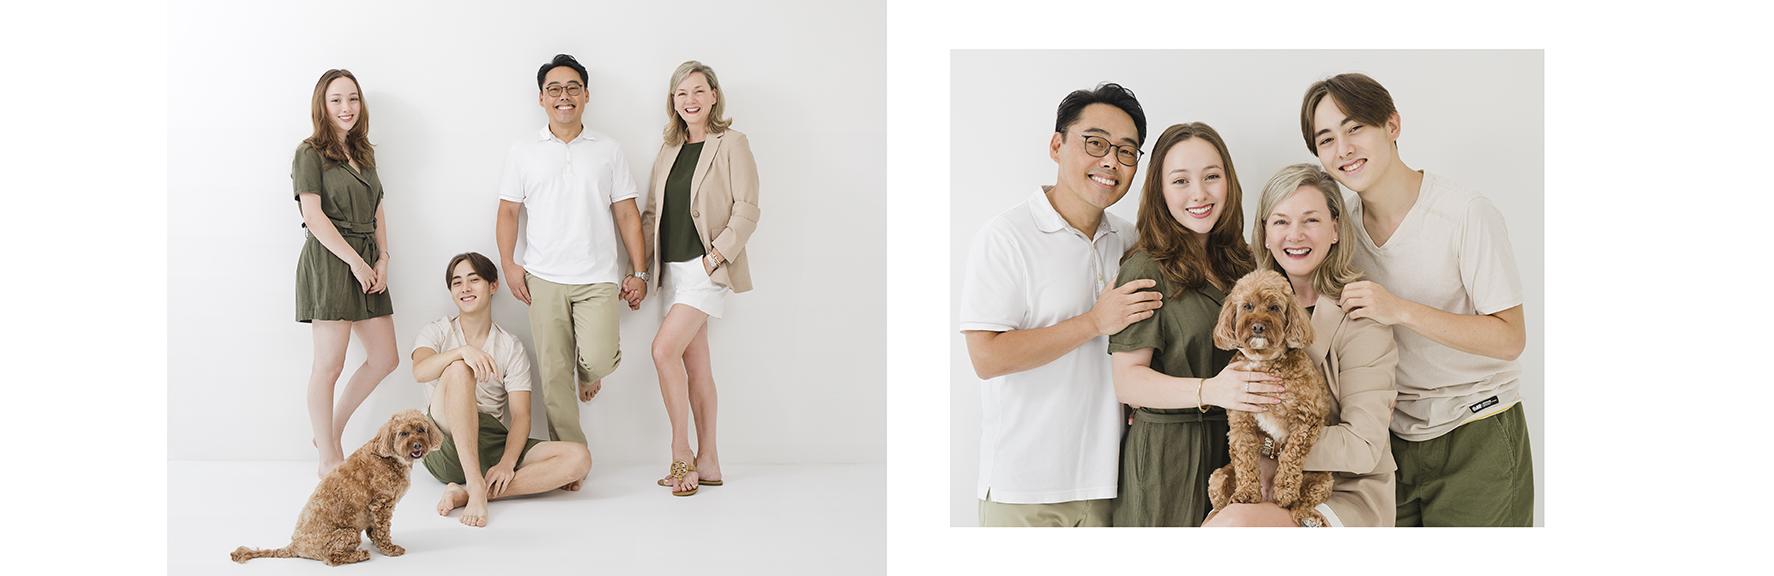 brooks_photo_familyday_패밀리데이_스튜ᄃ